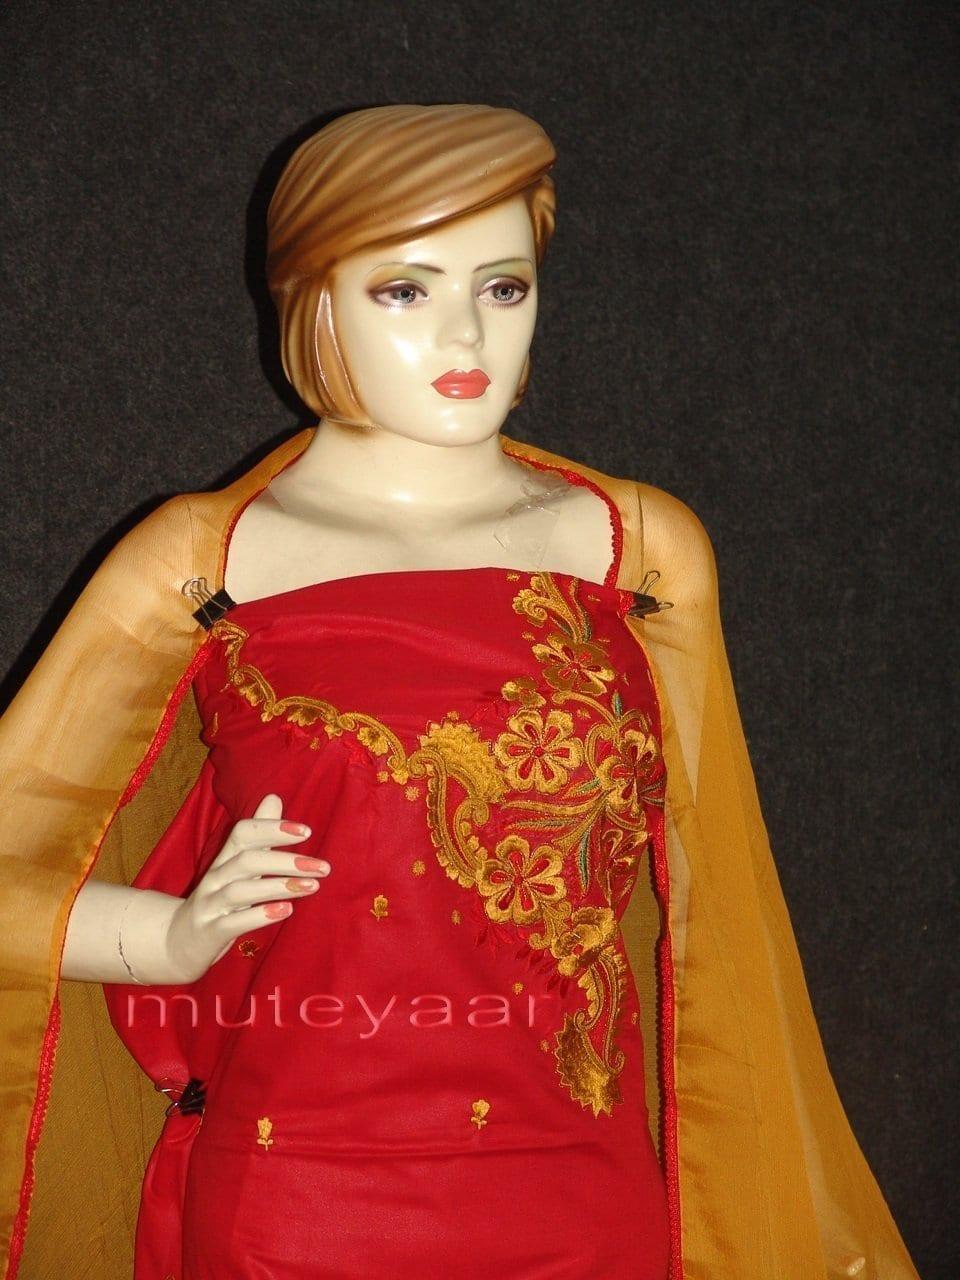 FULL PATIALA 100% cotton Salwar Suit PURE CHIFFON Dupatta RM235 2